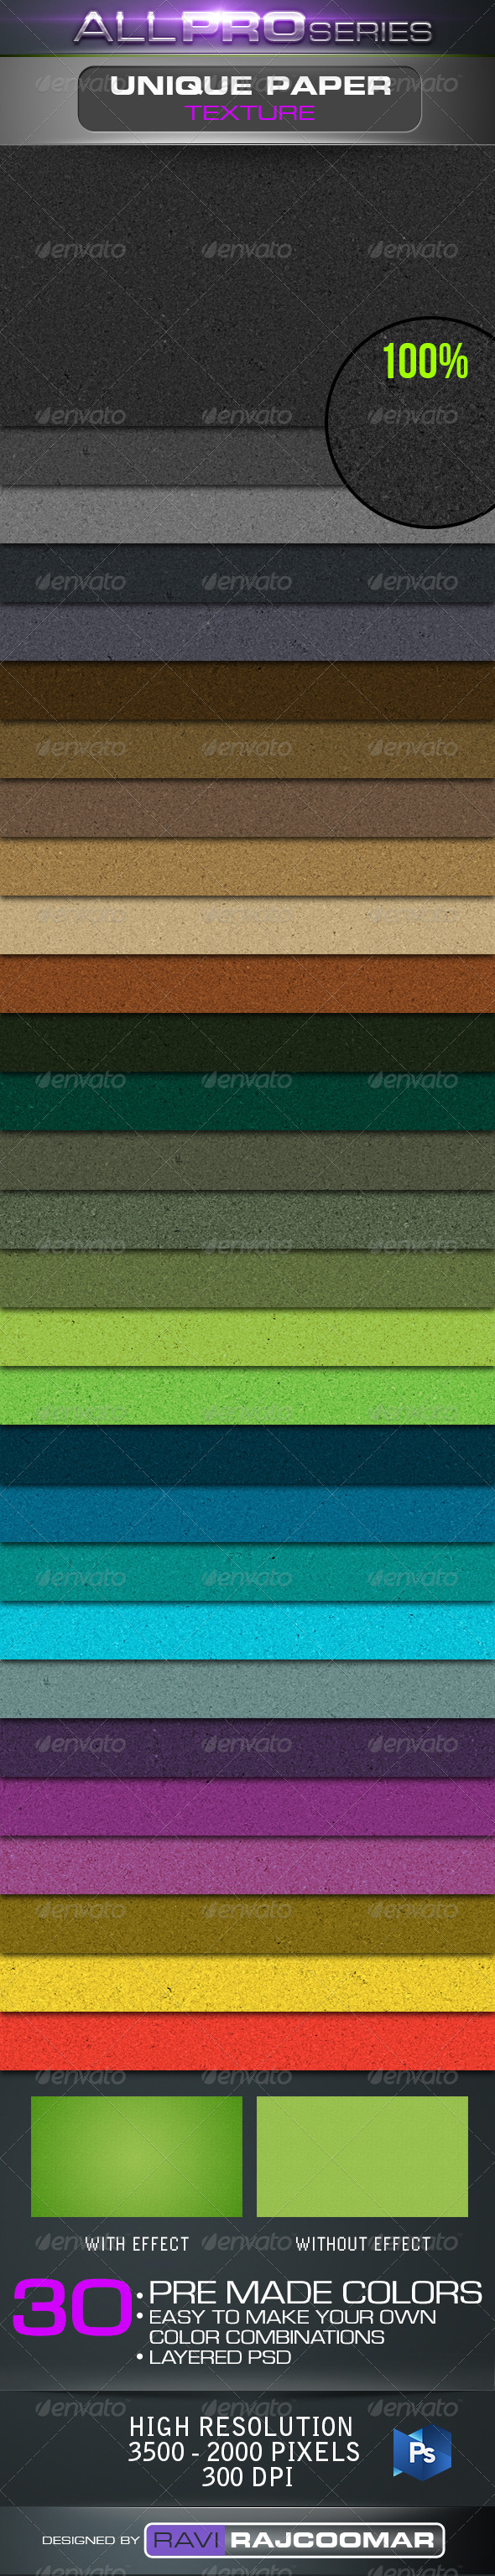 GraphicRiver Unique Paper Texture 2576174